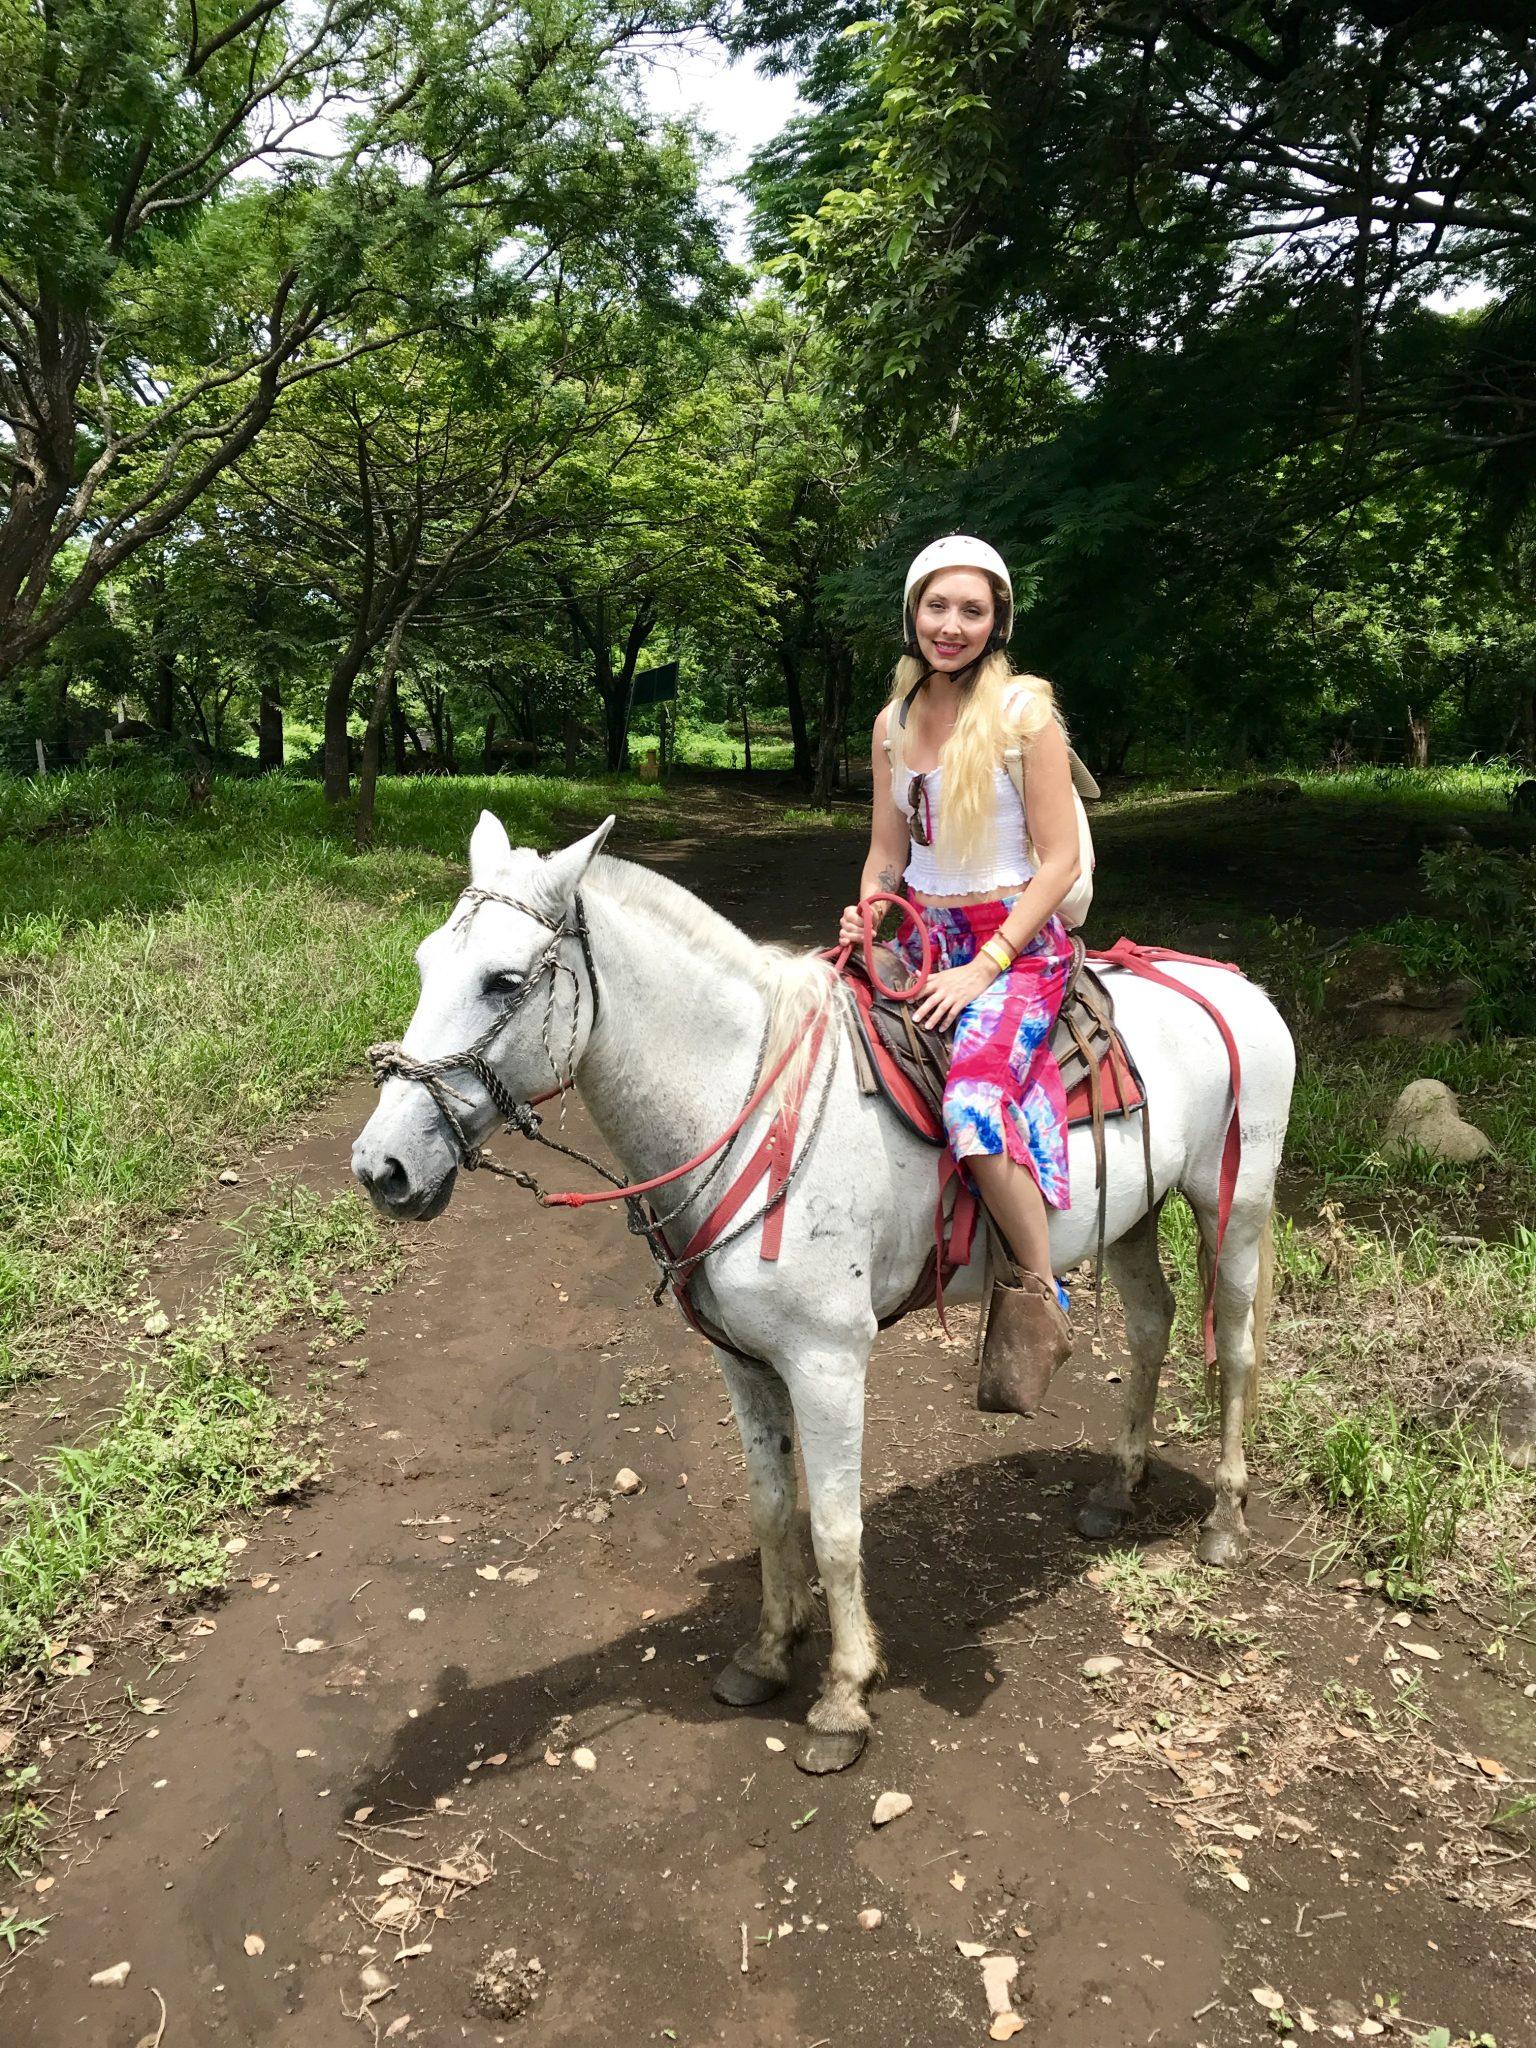 rincon de la vieja, waterfall, oropendula, horseback riding, costa rica